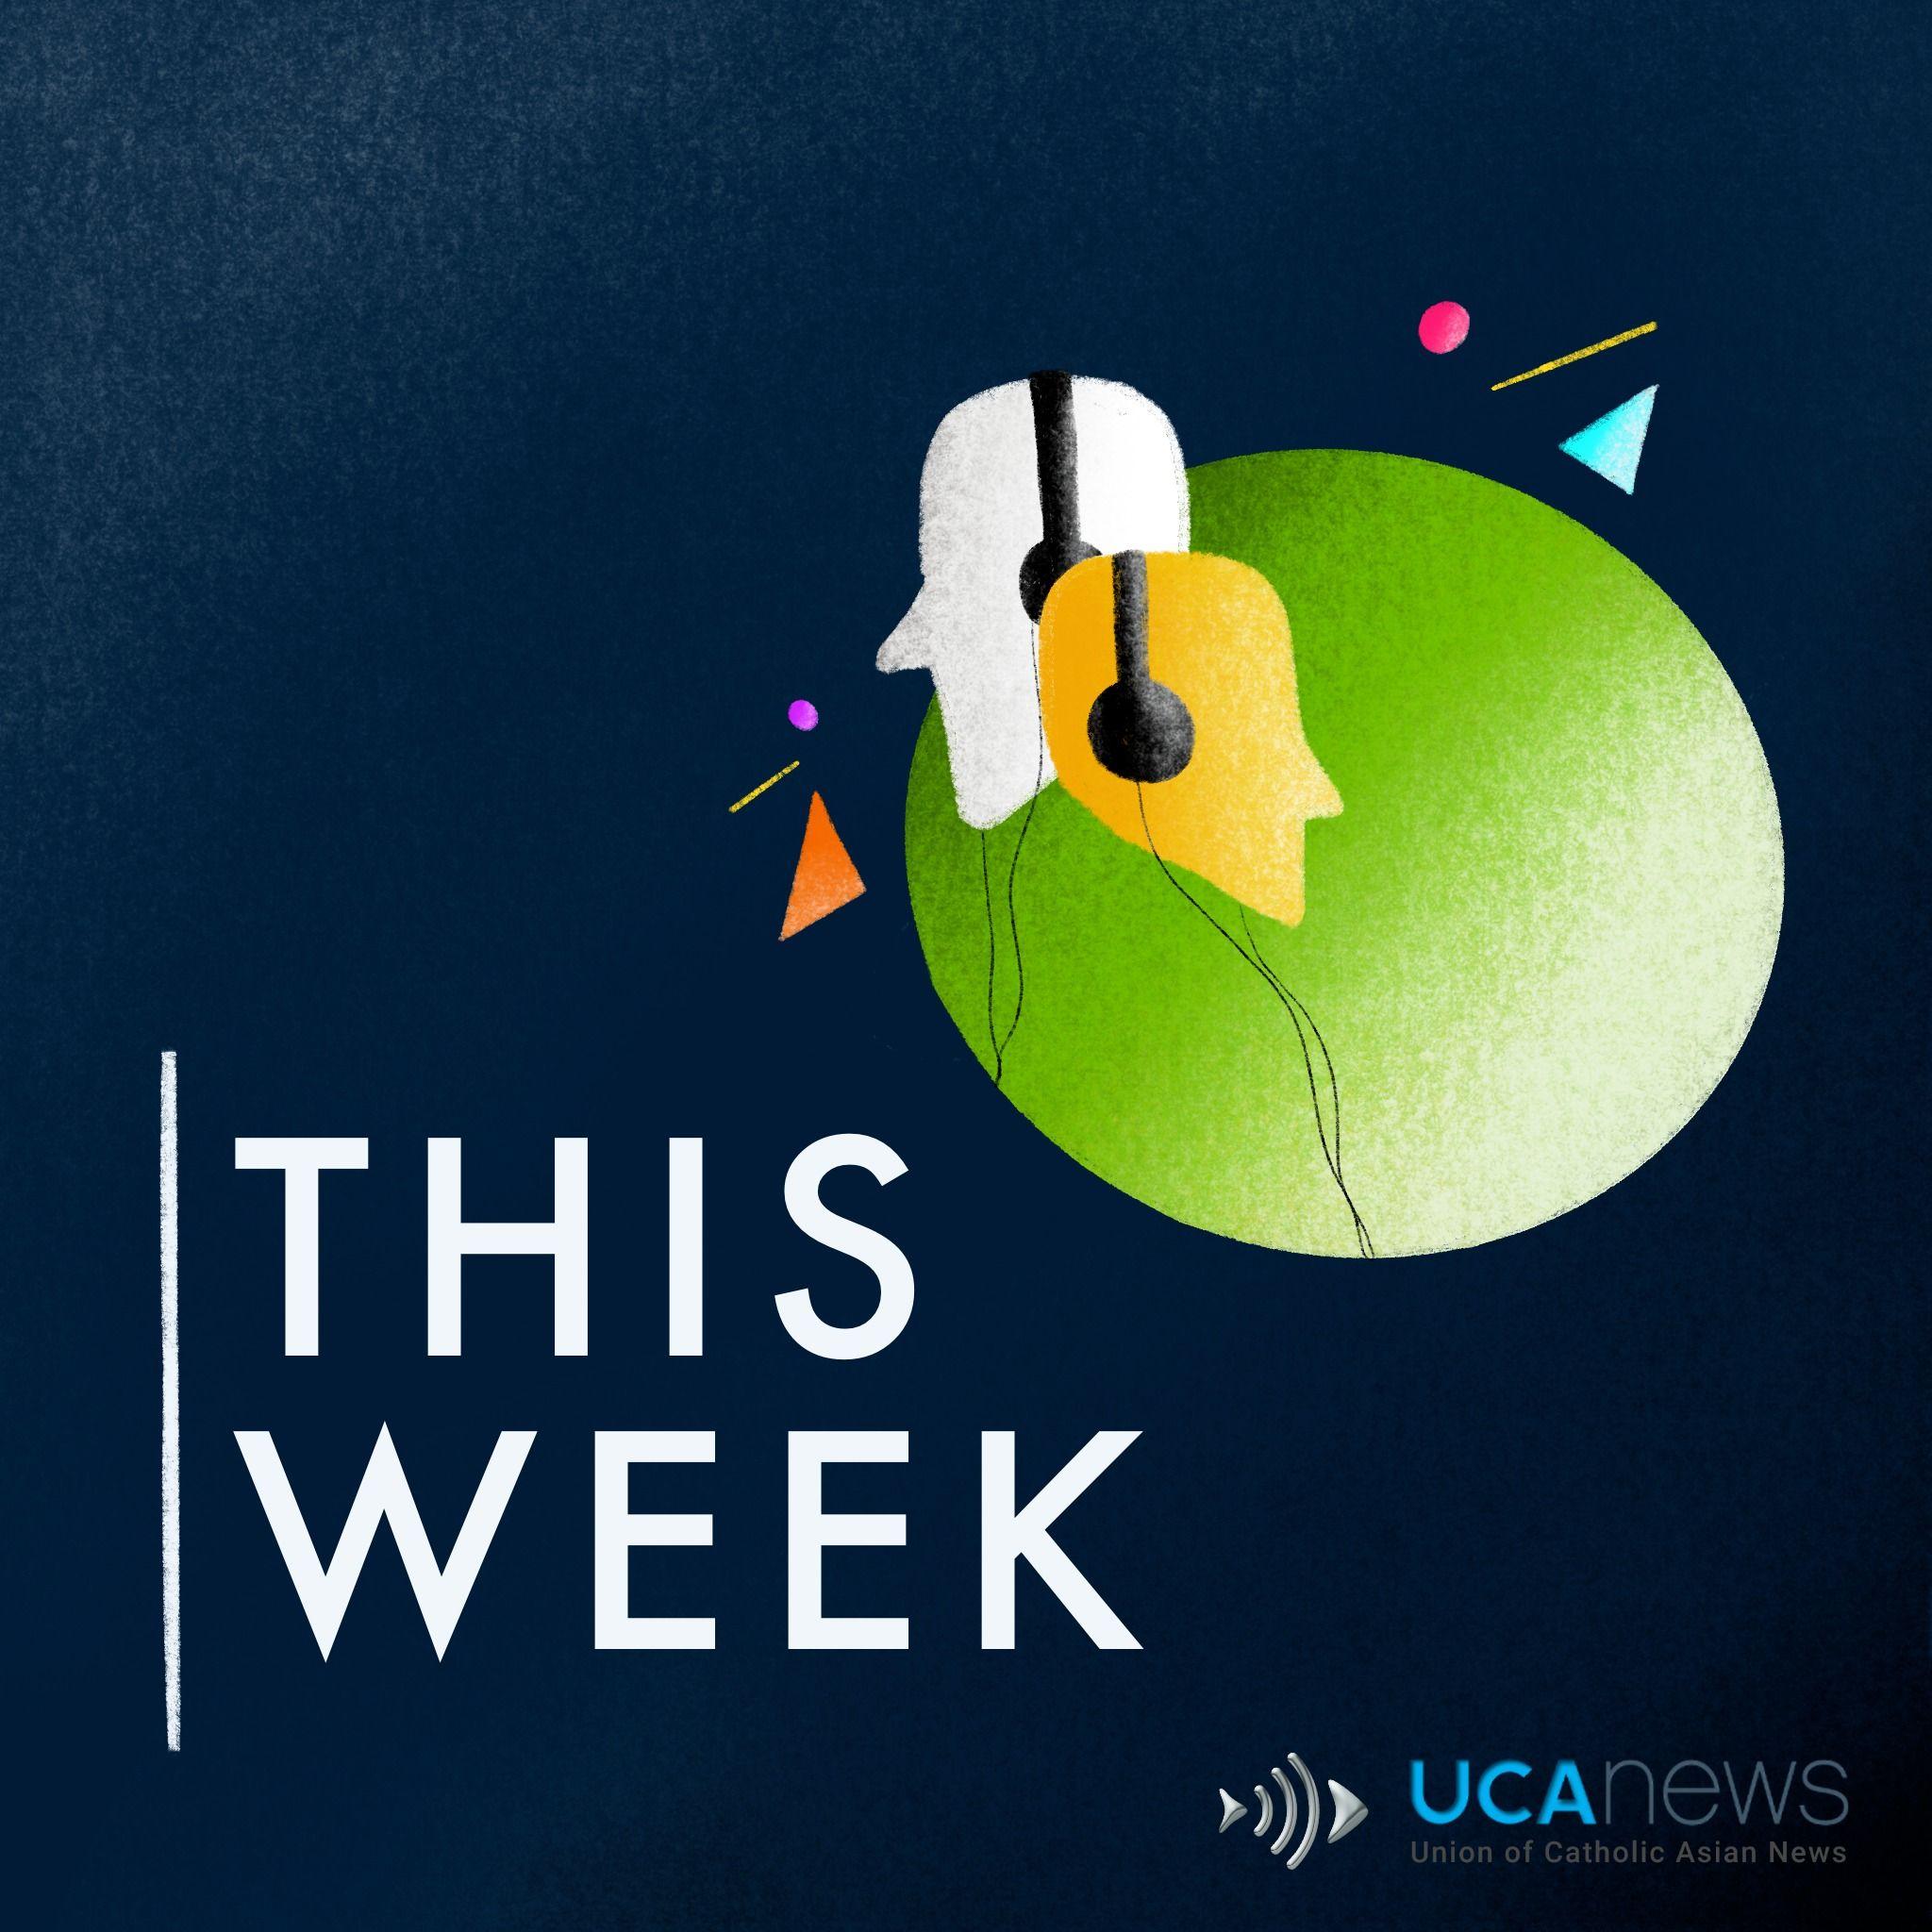 UCA News Weekly Summary, June 18, 2021